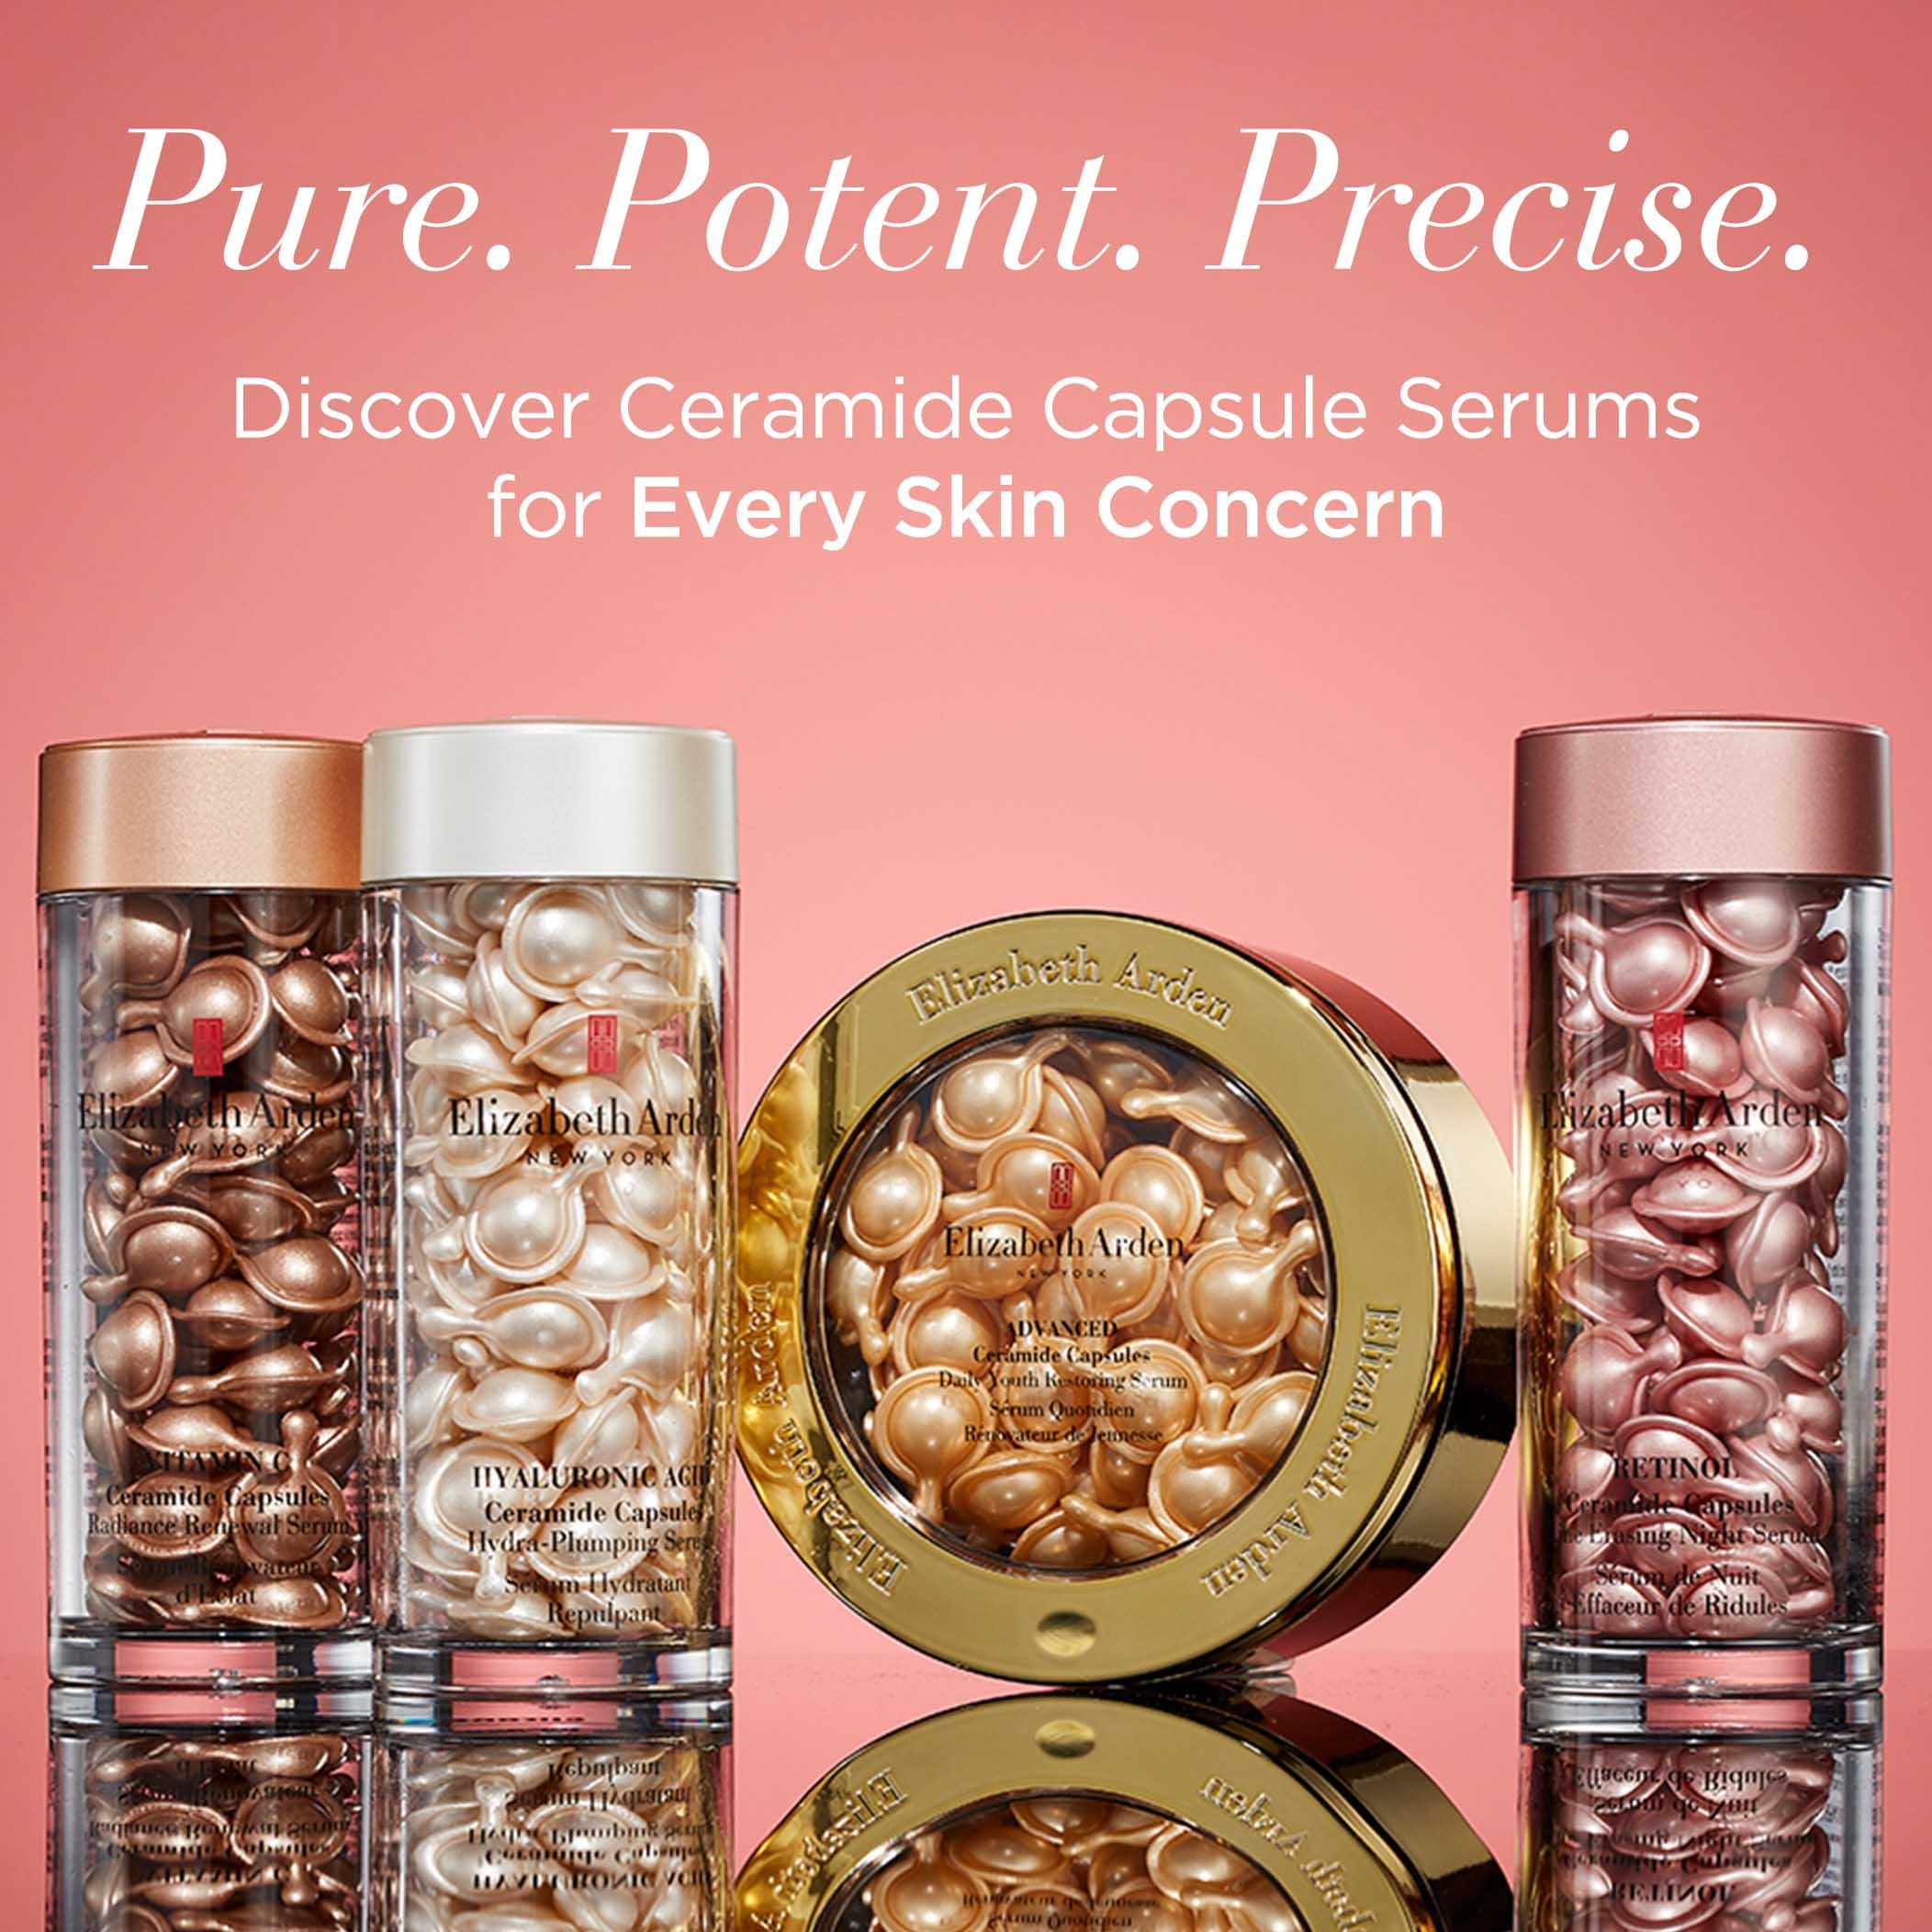 Discover Ceramide Capsule Serums for Every Skin Concern